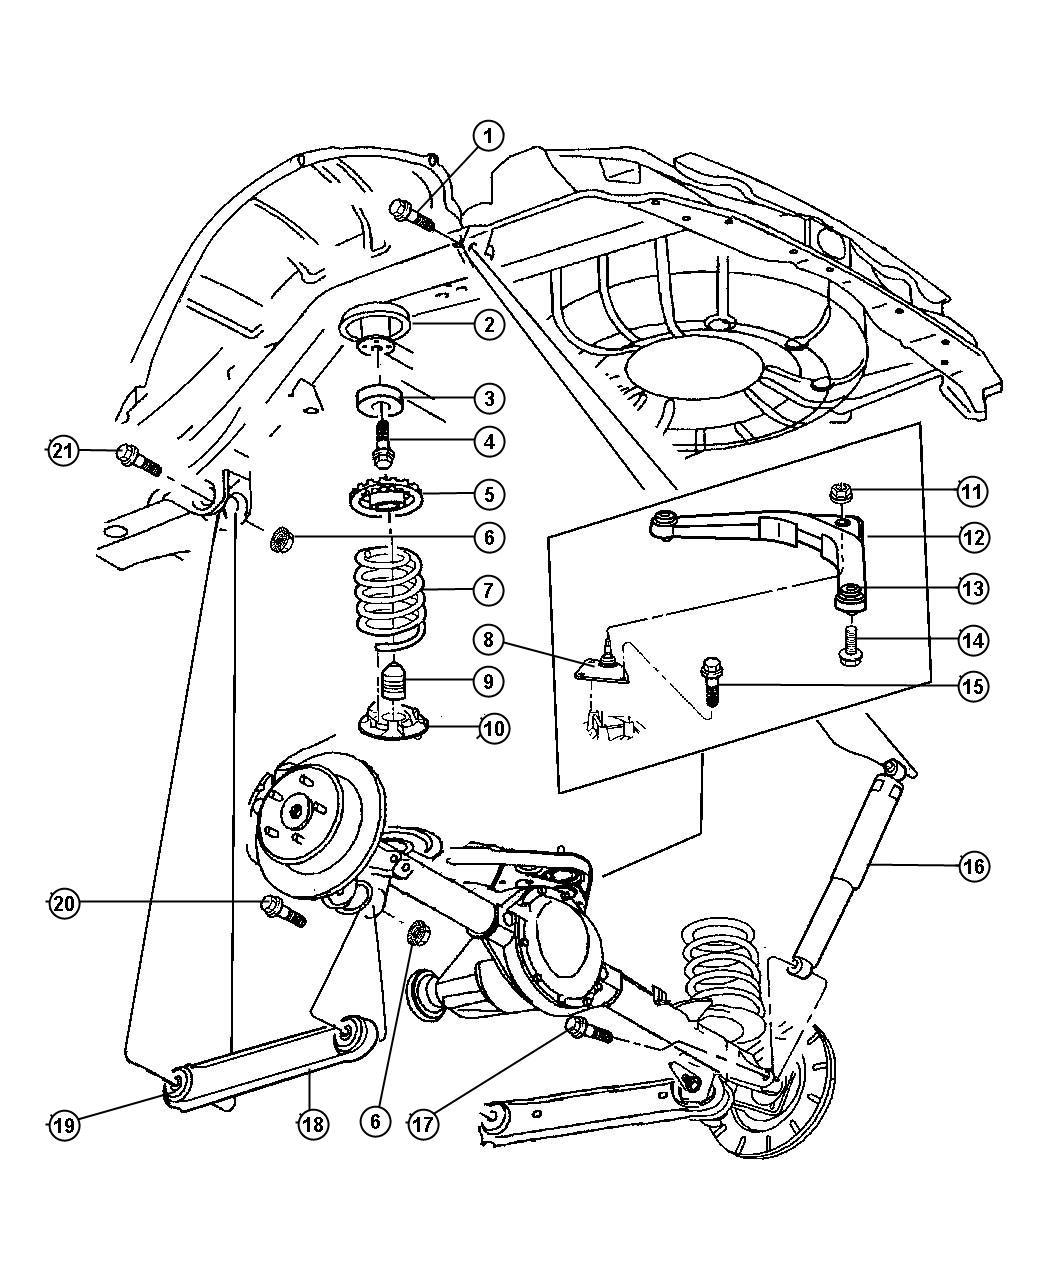 Jeep Grand Cherokee Bushing Control Arm Upper